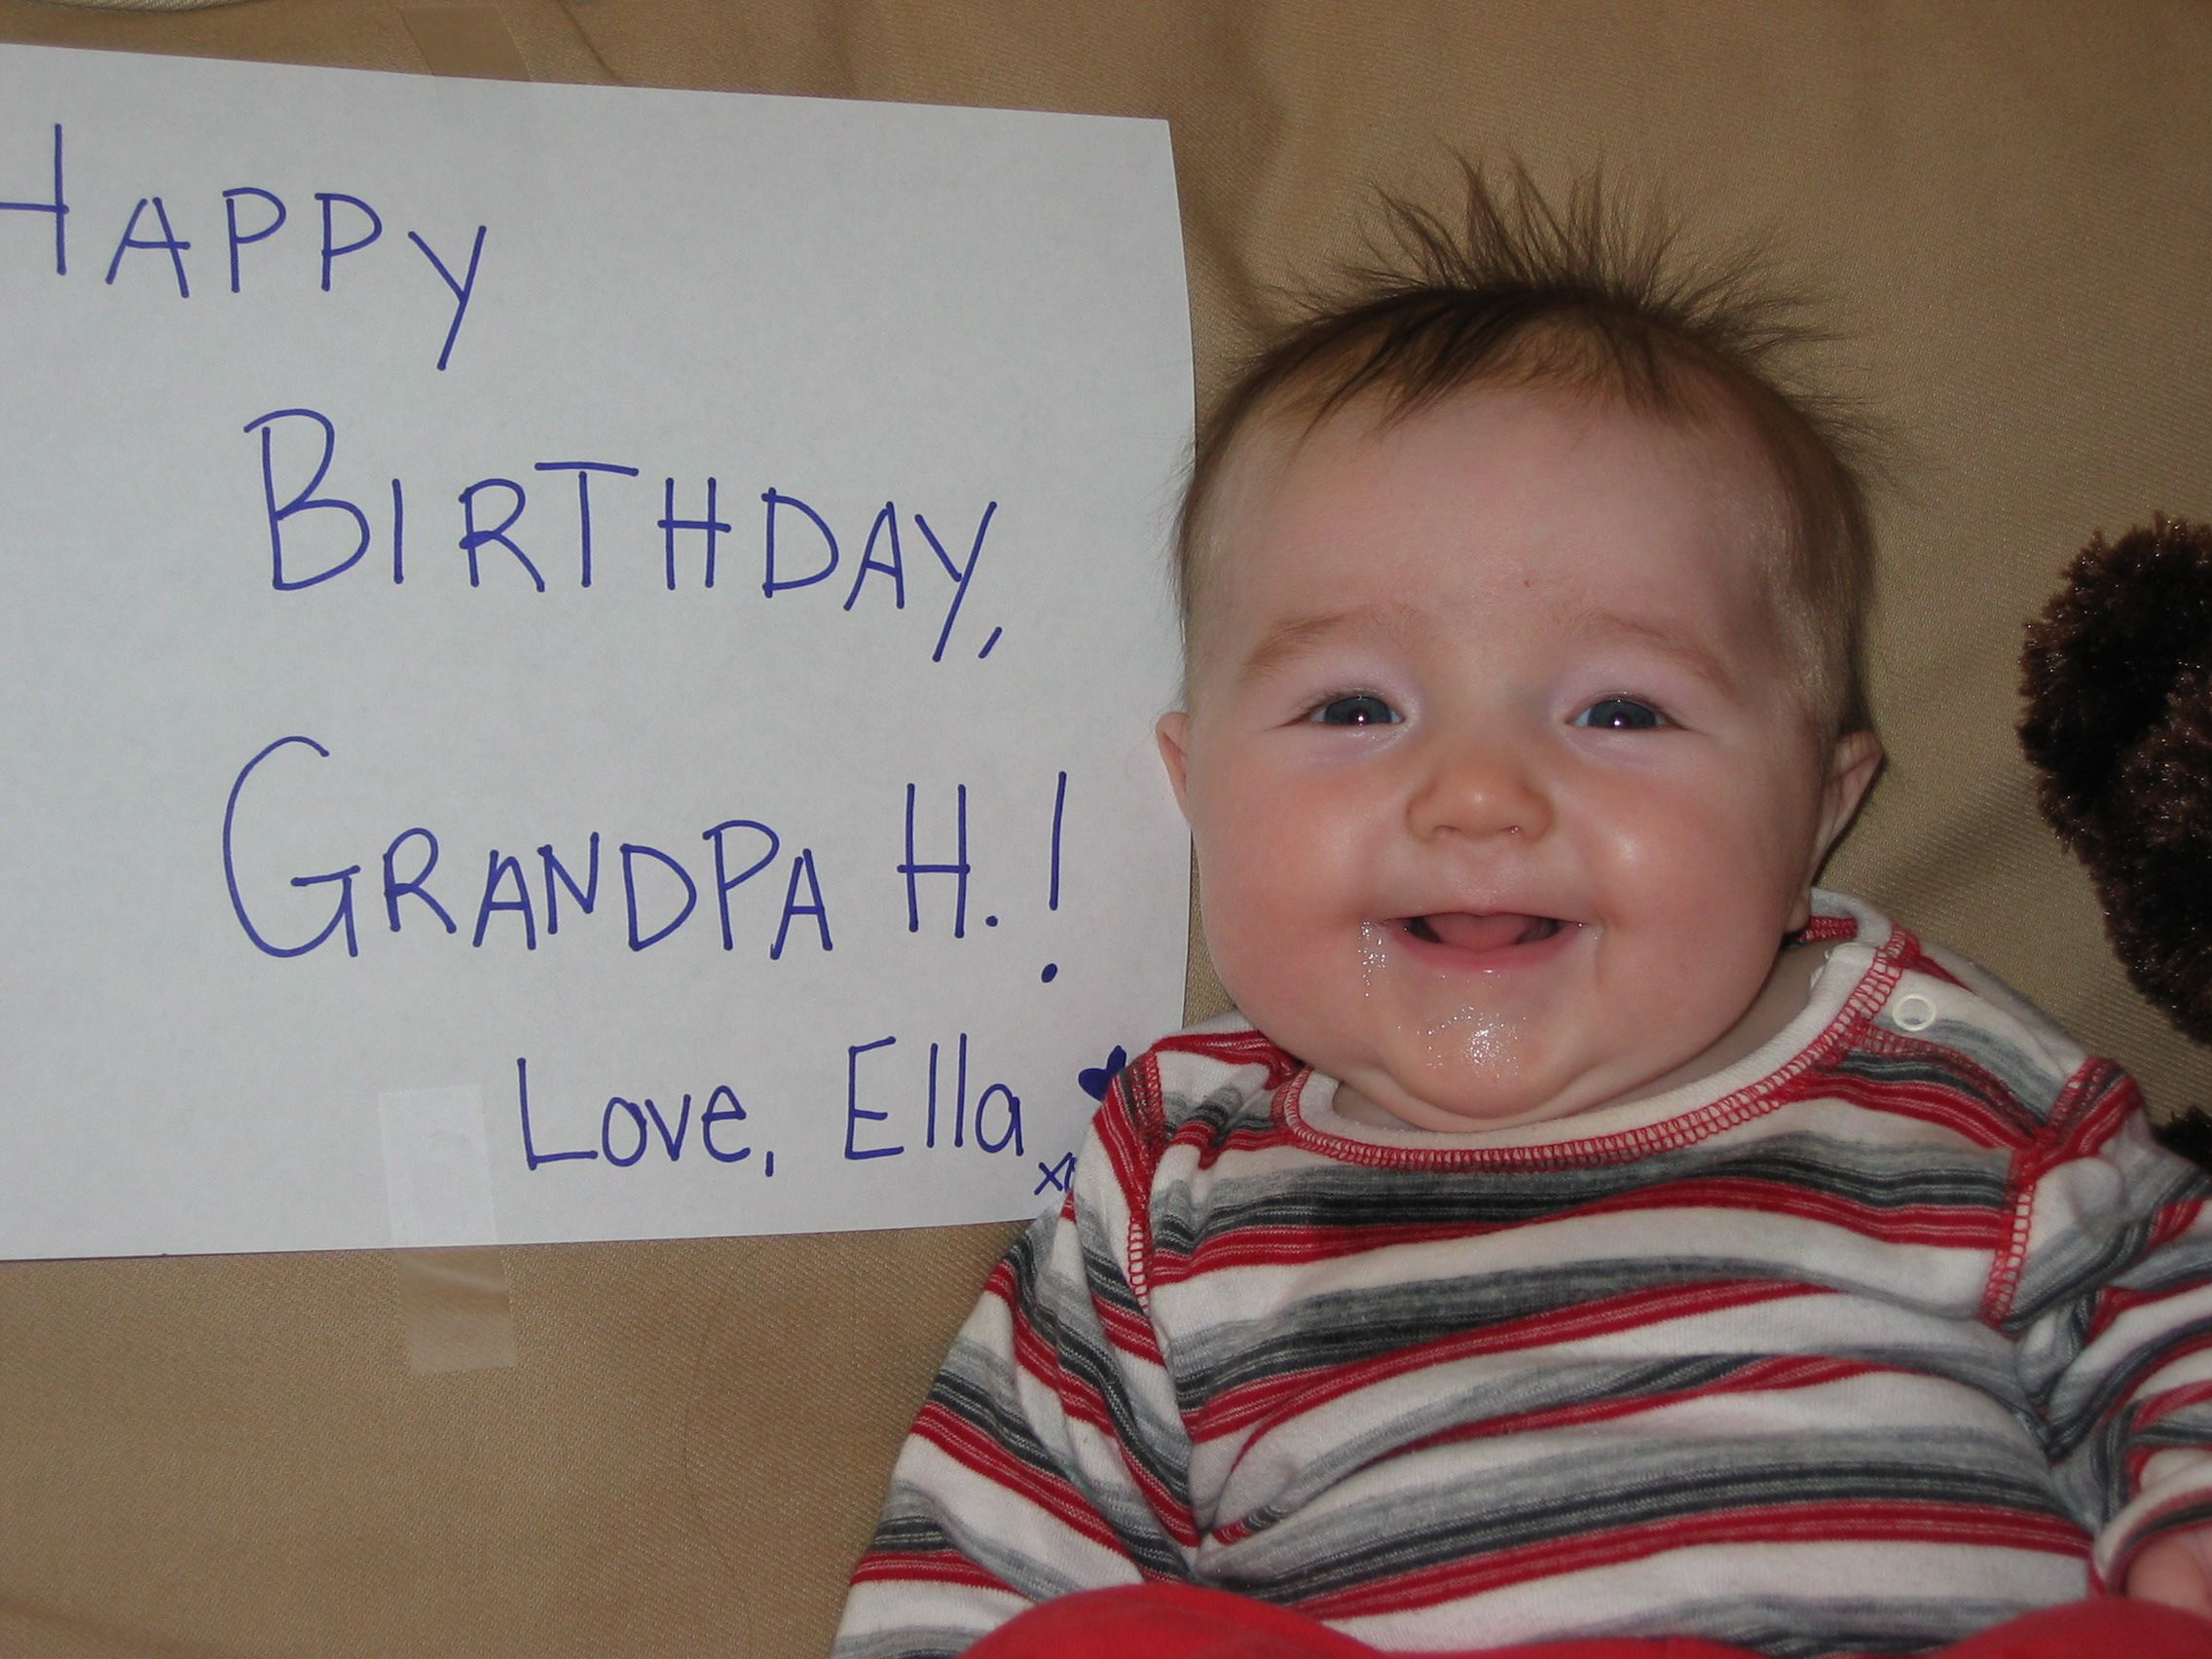 Easy peasy birthday card!